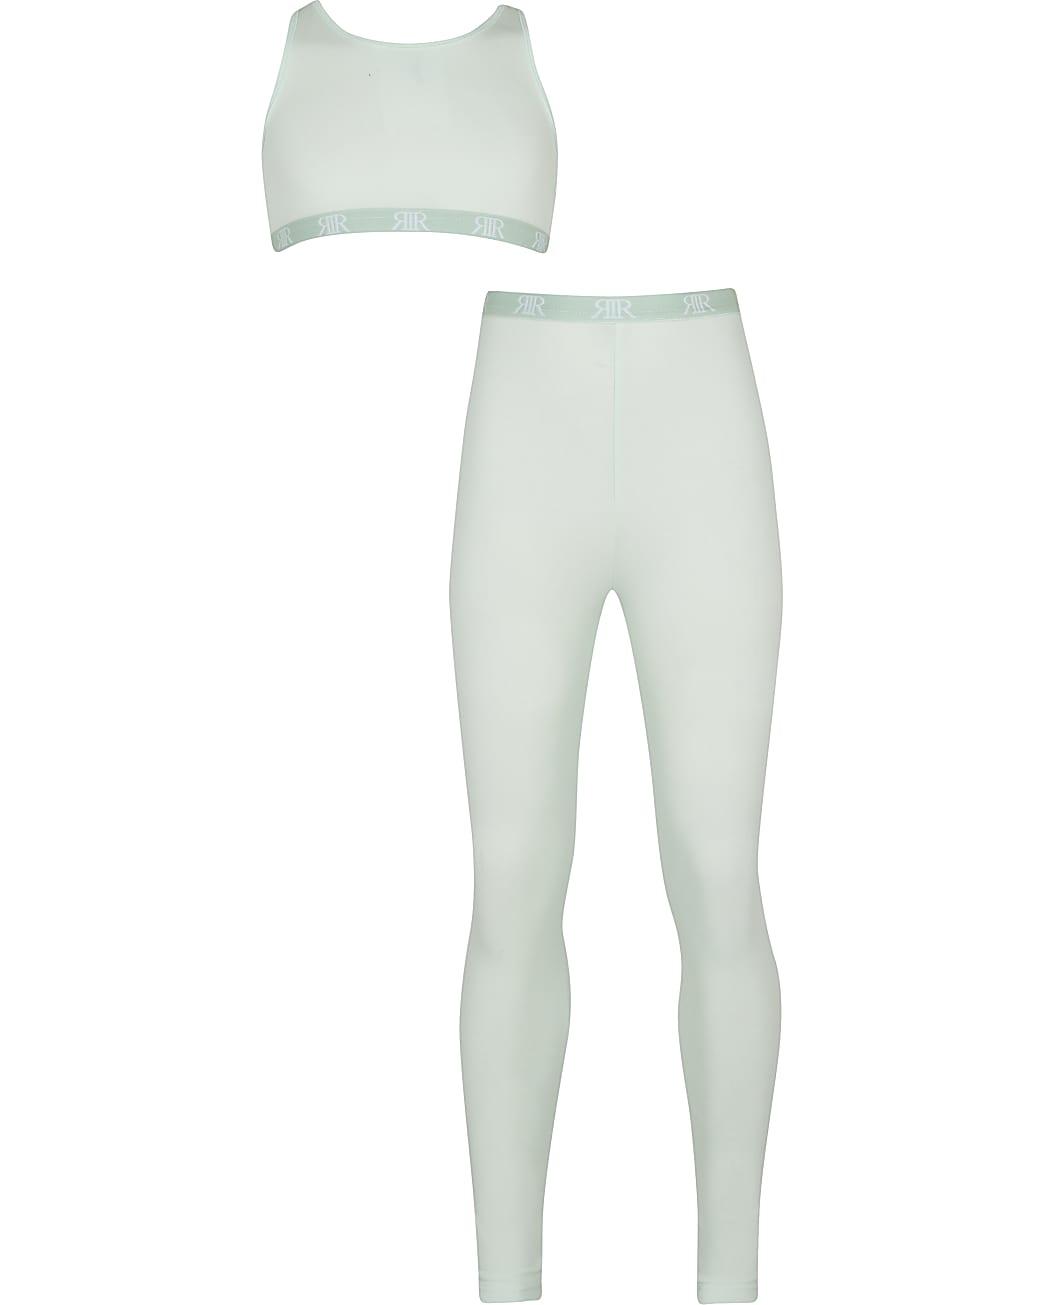 Girls green crop & legging outfit